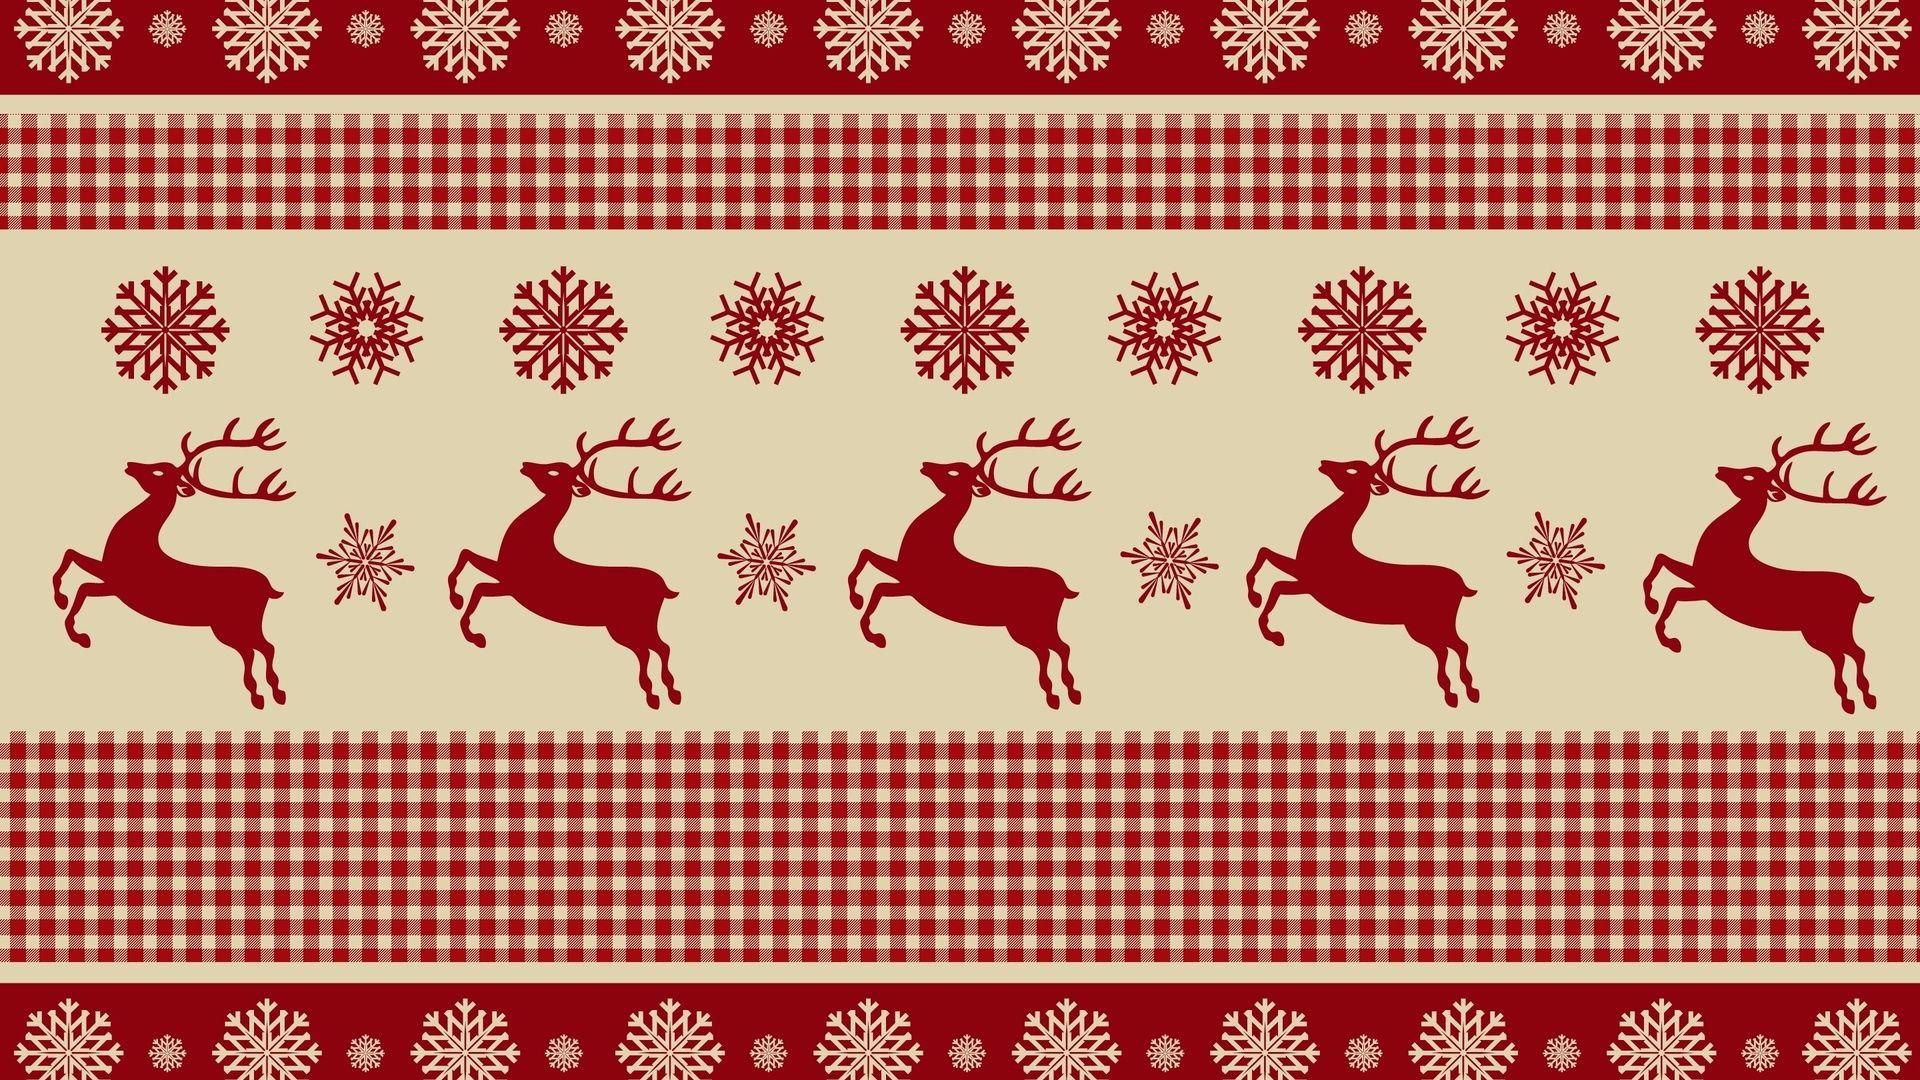 Christmas Scrapbooking HD 1080 wallpaper